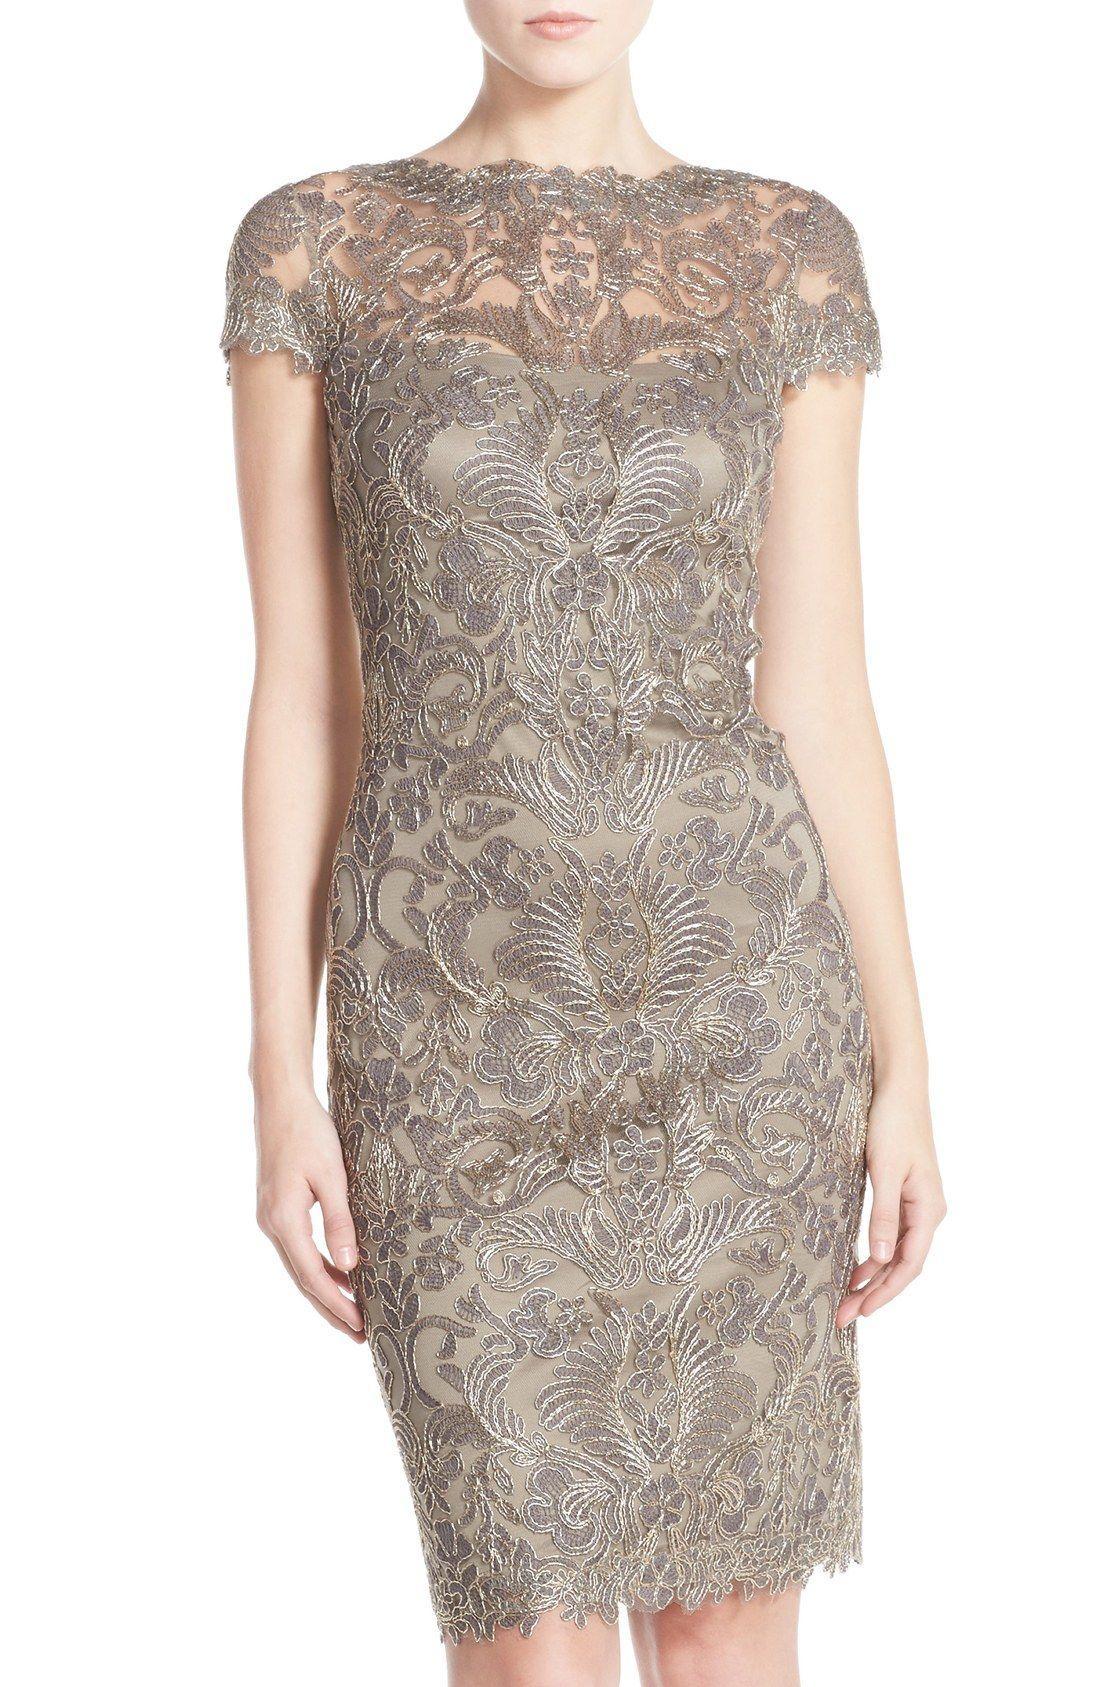 Illusion Yoke Lace Sheath Dress | Sheath dresses, Overlays and Illusions